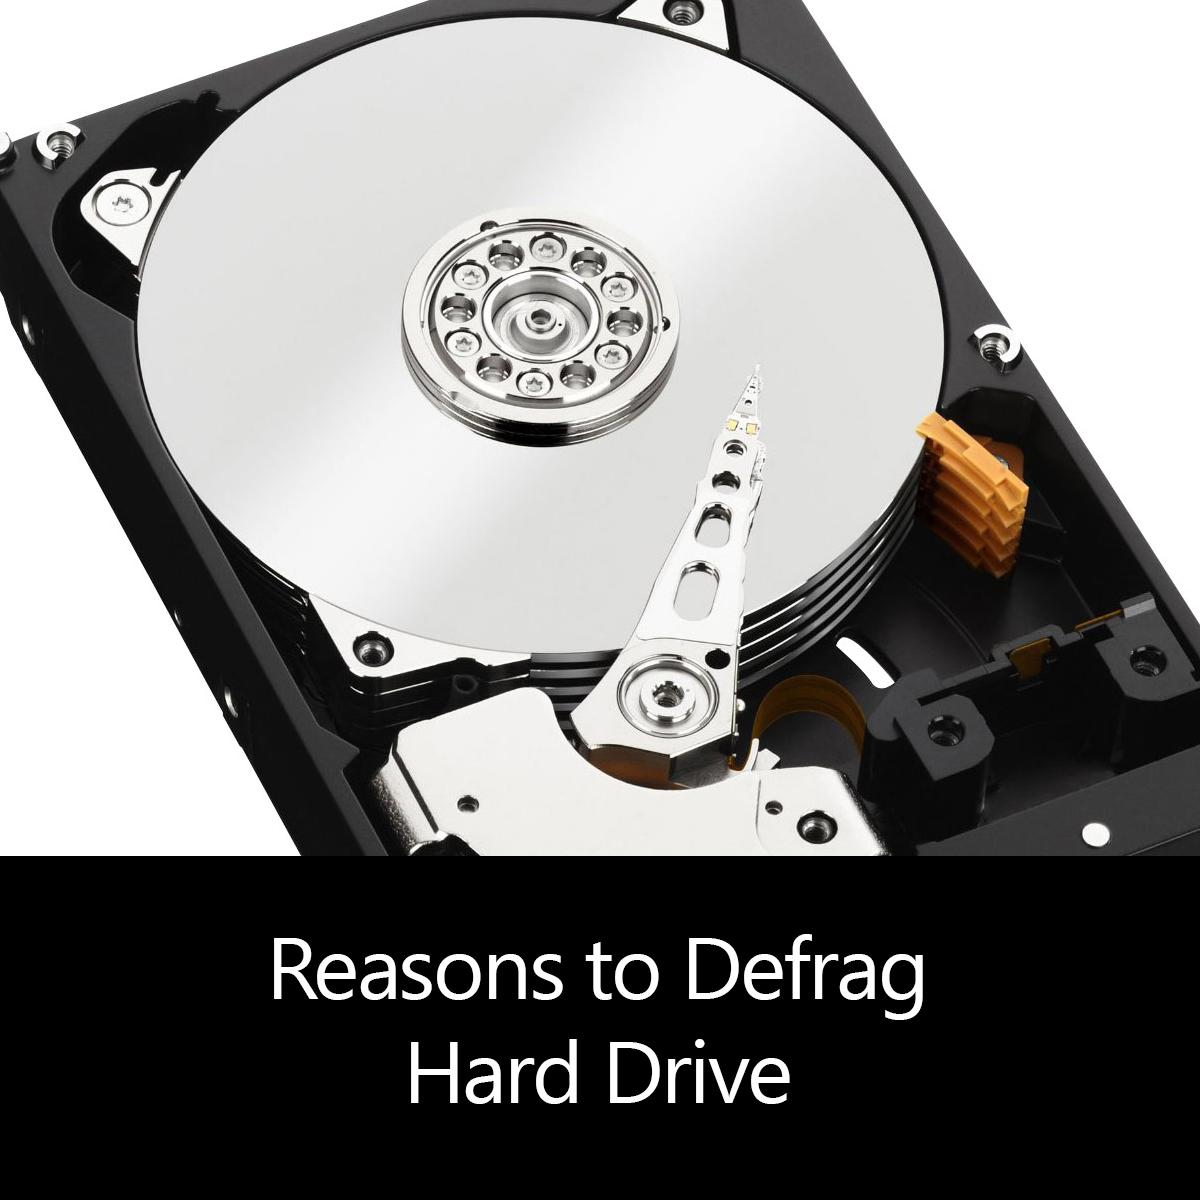 Reasons to Defrag Hard Drive